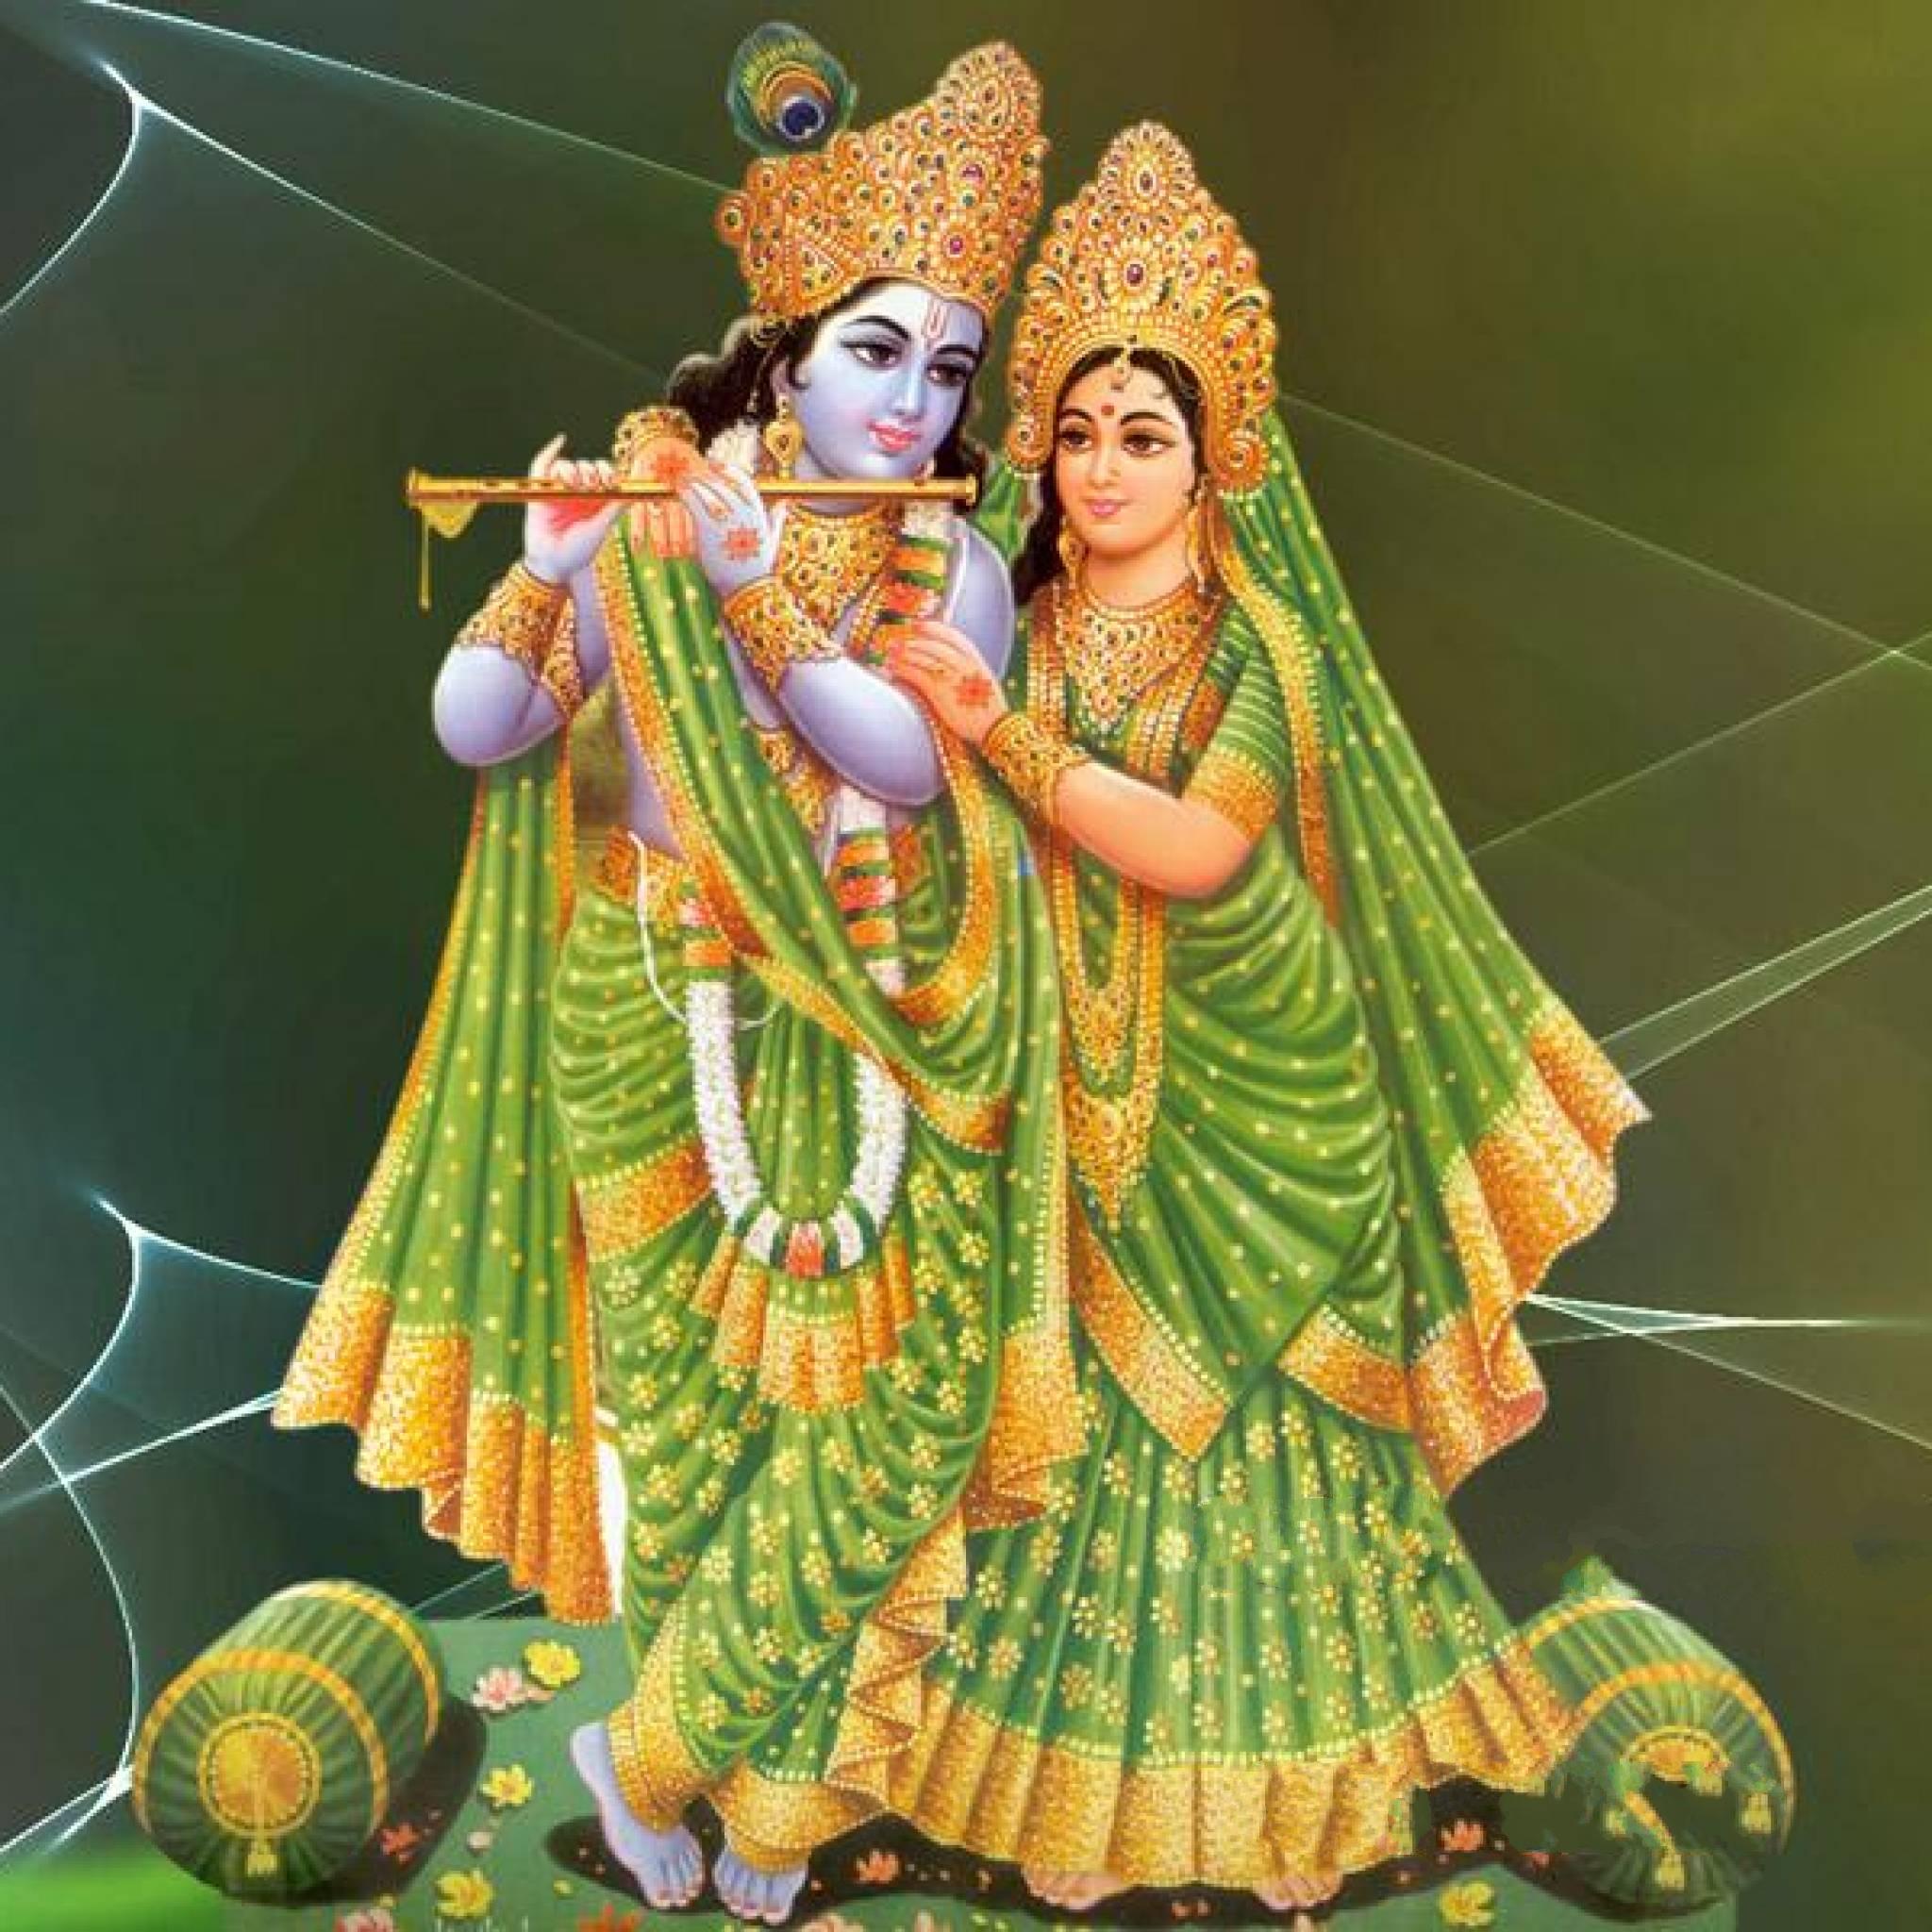 Download God Couple Radha Krishna 2048 X 2048 Wallpapers   4565799   Hindu God Goddess Hinduism | Mobile9 - Radha Krishna, Transparent background PNG HD thumbnail